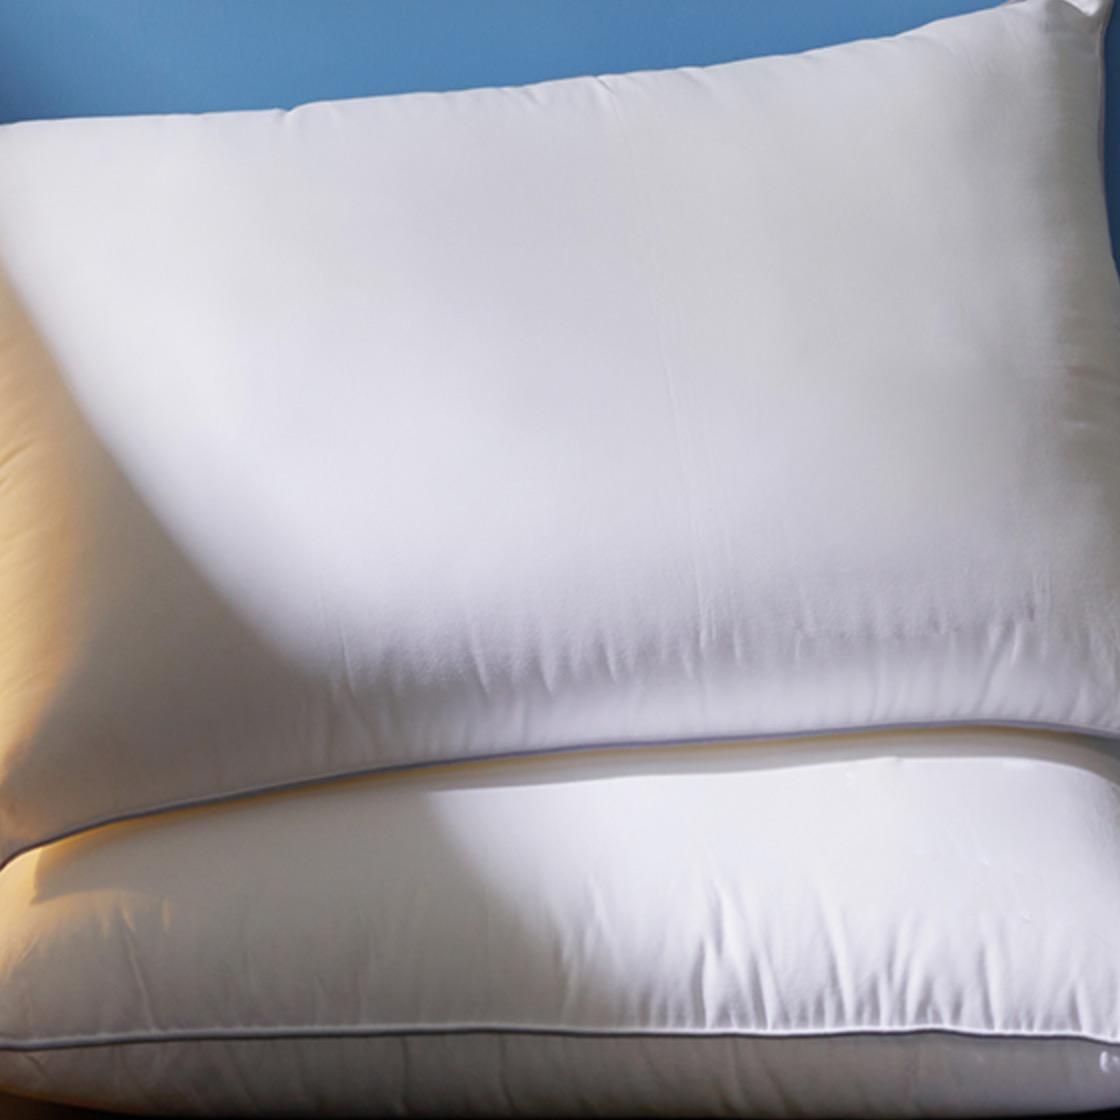 BEYOND 博洋 安芯睡眠枕 1只装